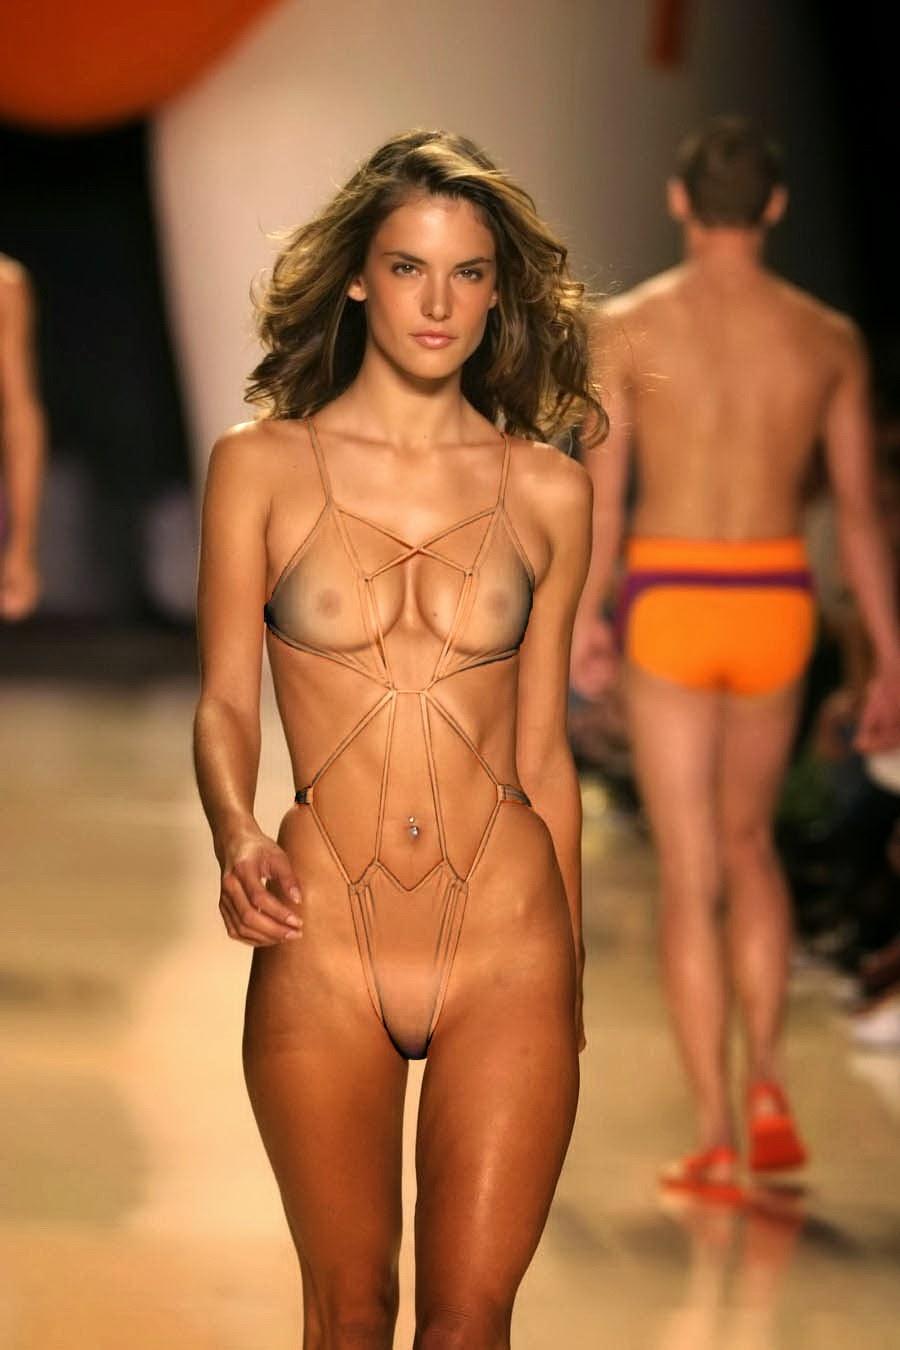 Alessandra Ambrosio Nude on a Cat Walk